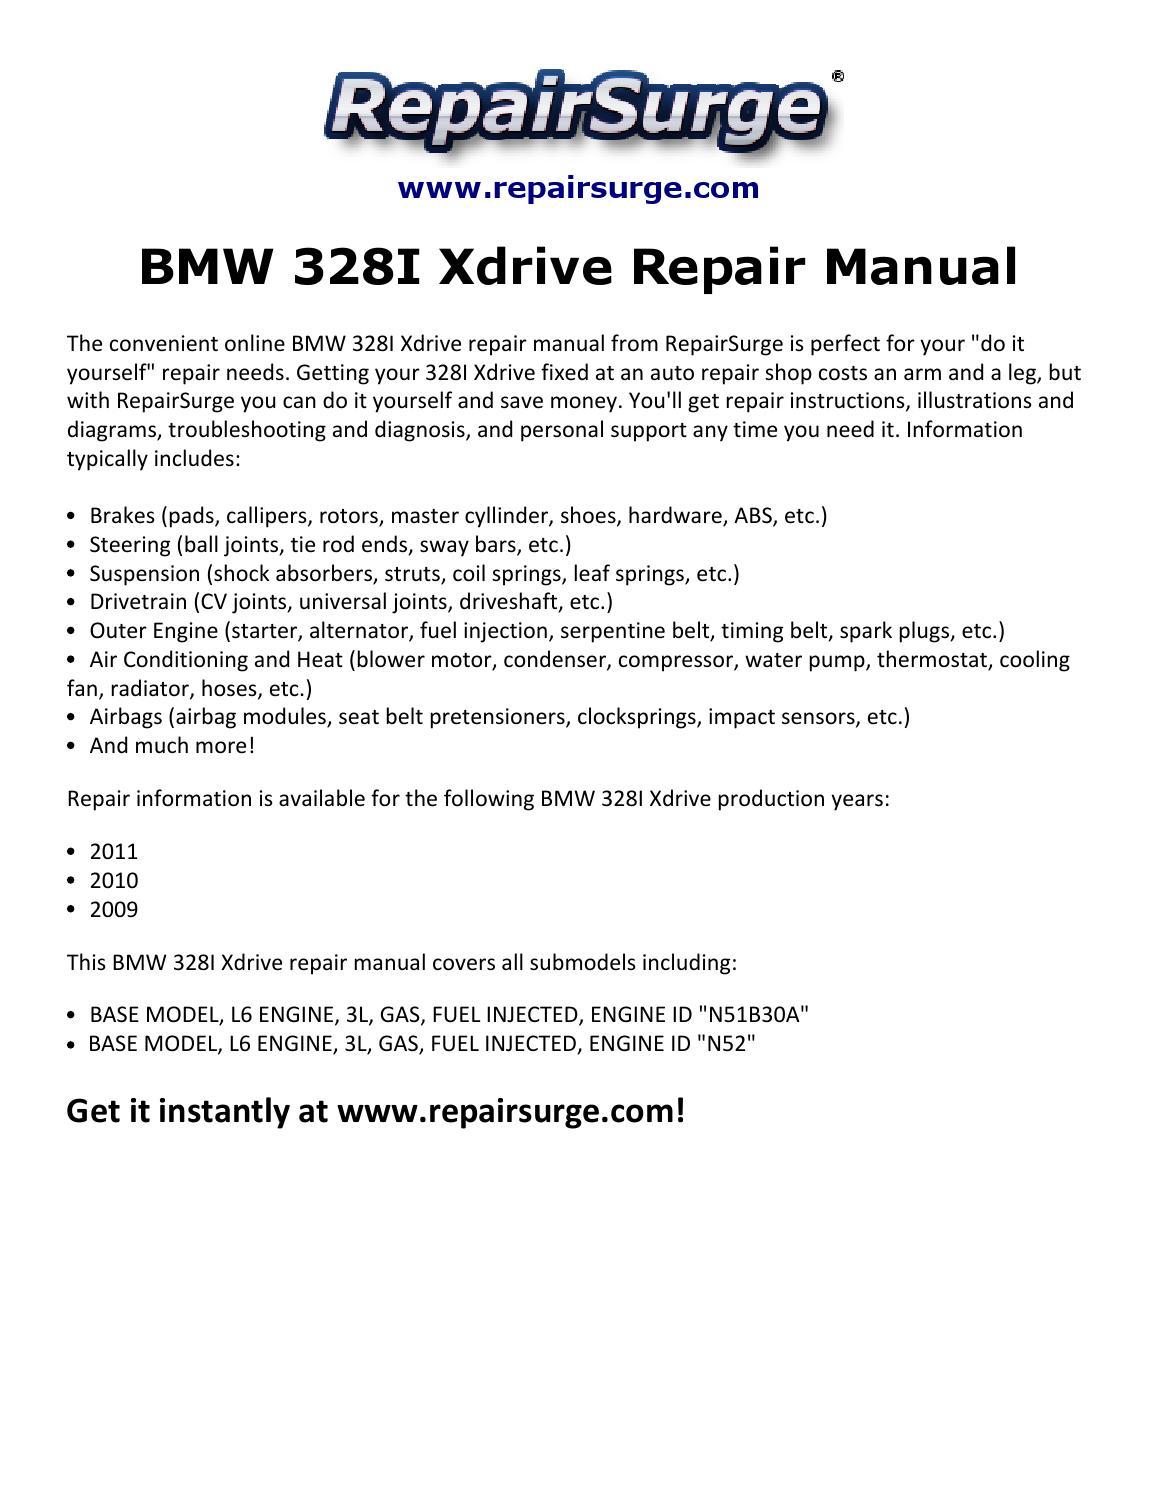 Bmw 328i Xdrive Repair Manual 2009 2011 By Adamsnth Issuu 2002 BMW E46  Diagram Kbus 2011 Bmw 328i Xdrive Engine Diagrams